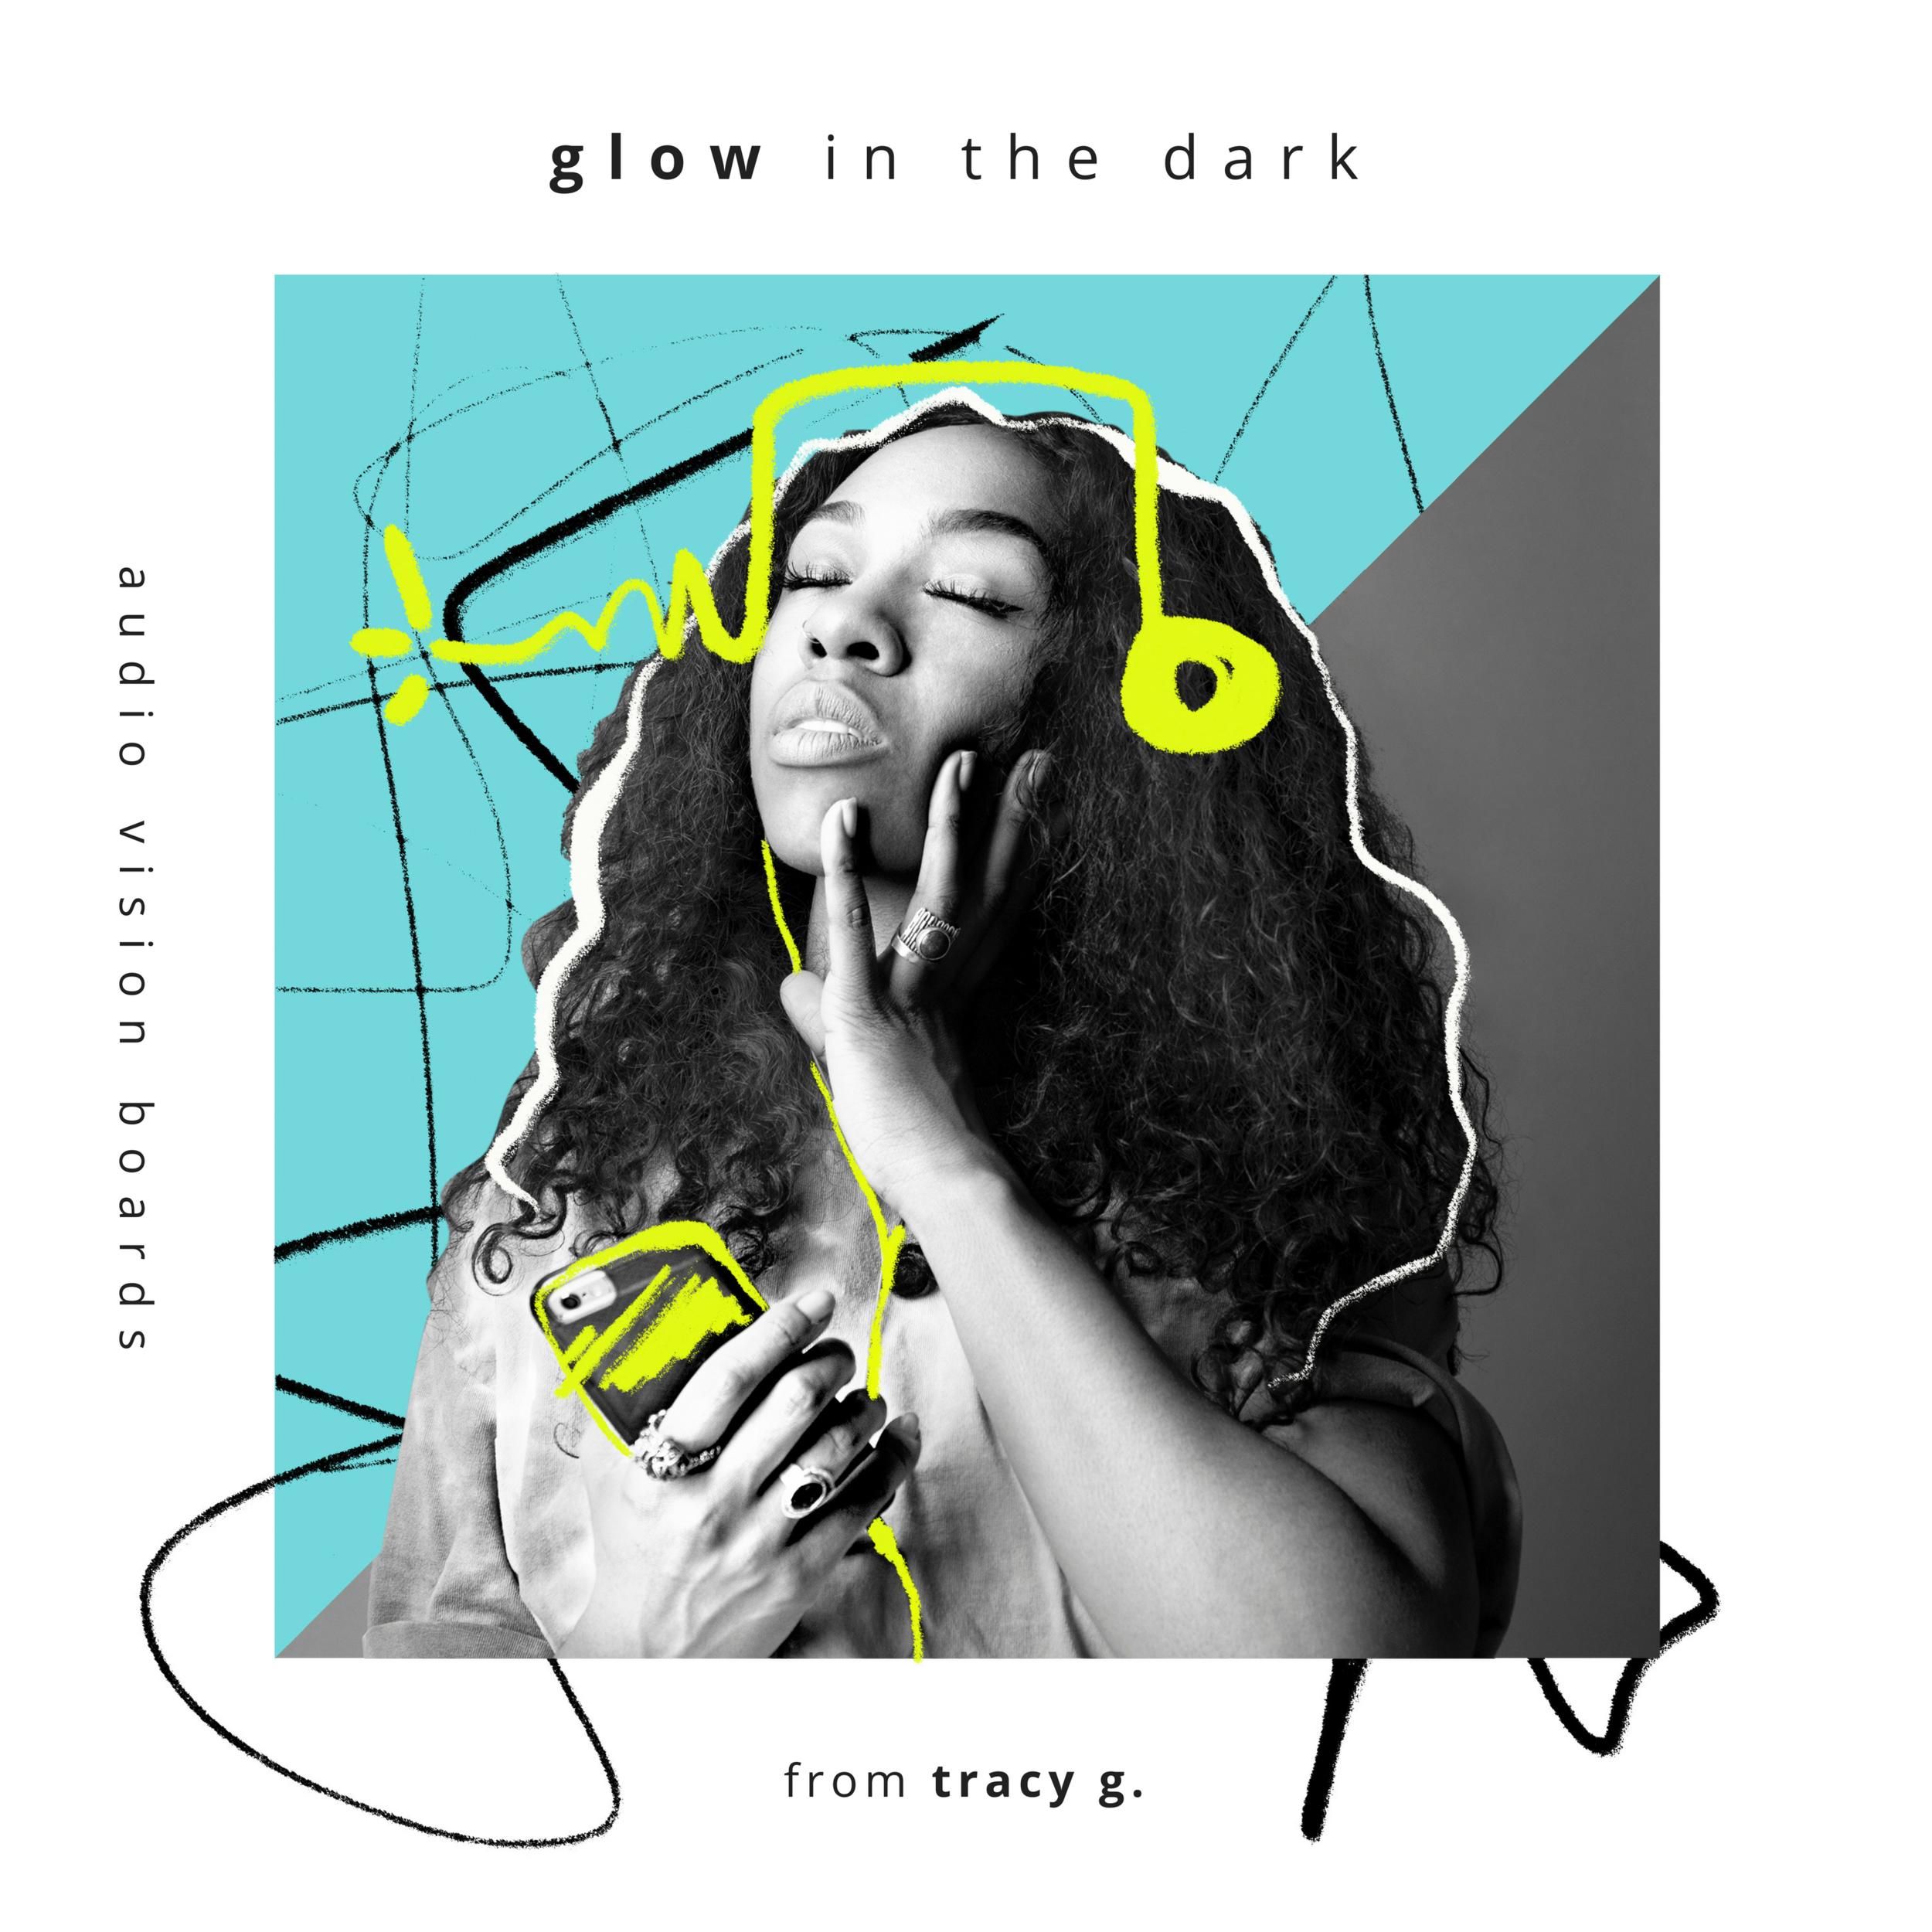 SUPER-FINAL-COVER-glow in the dark.png